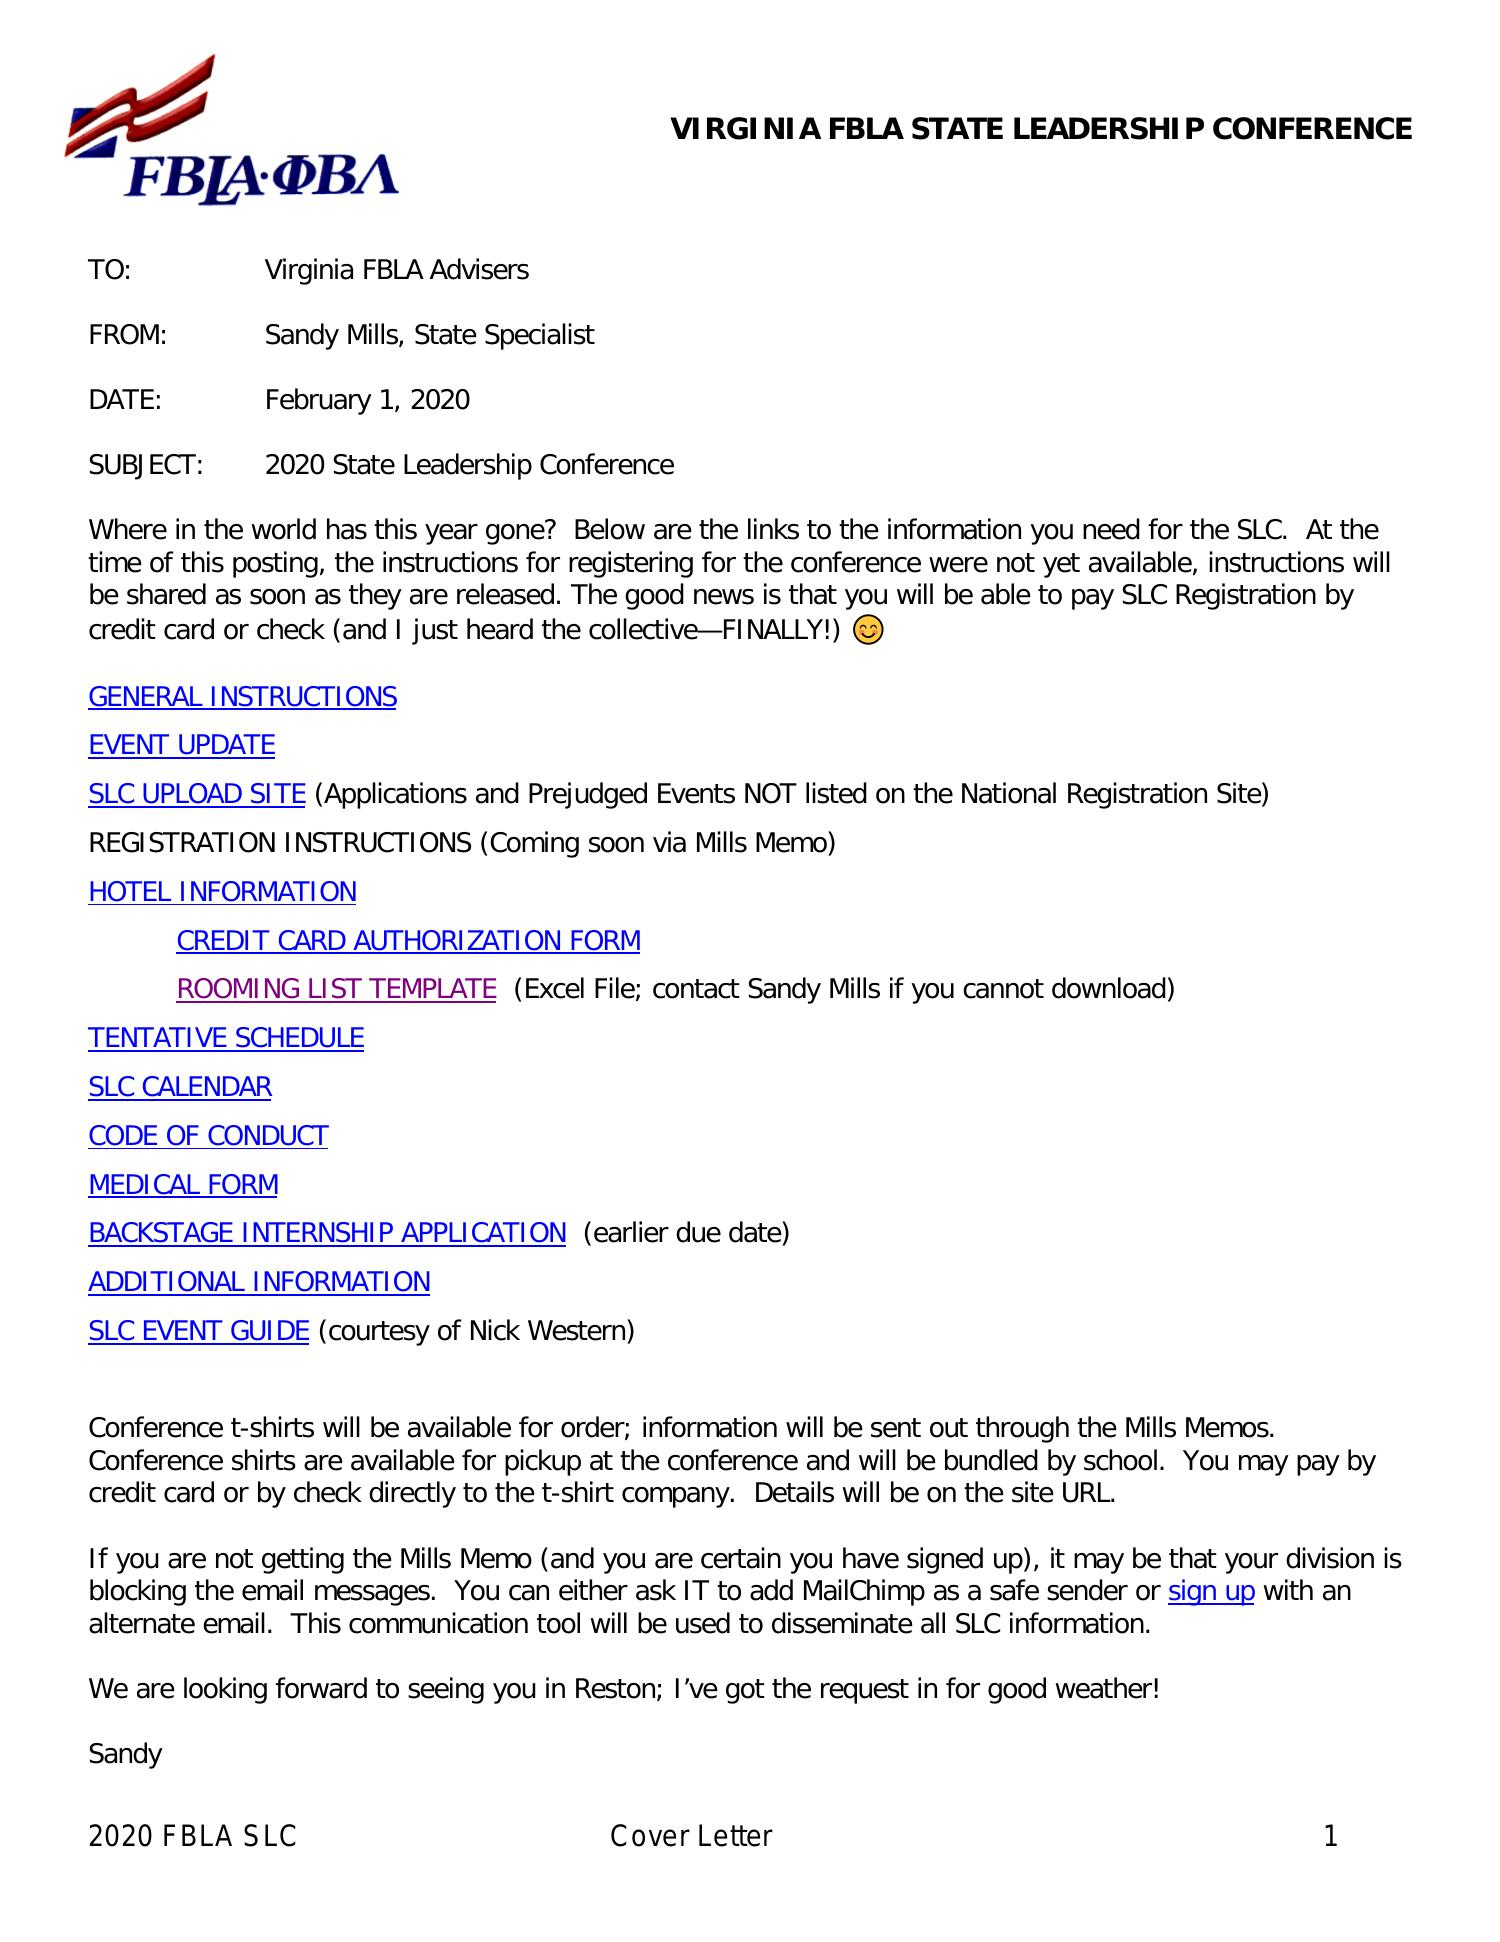 Cover Letter 2020 pdf DocDroid